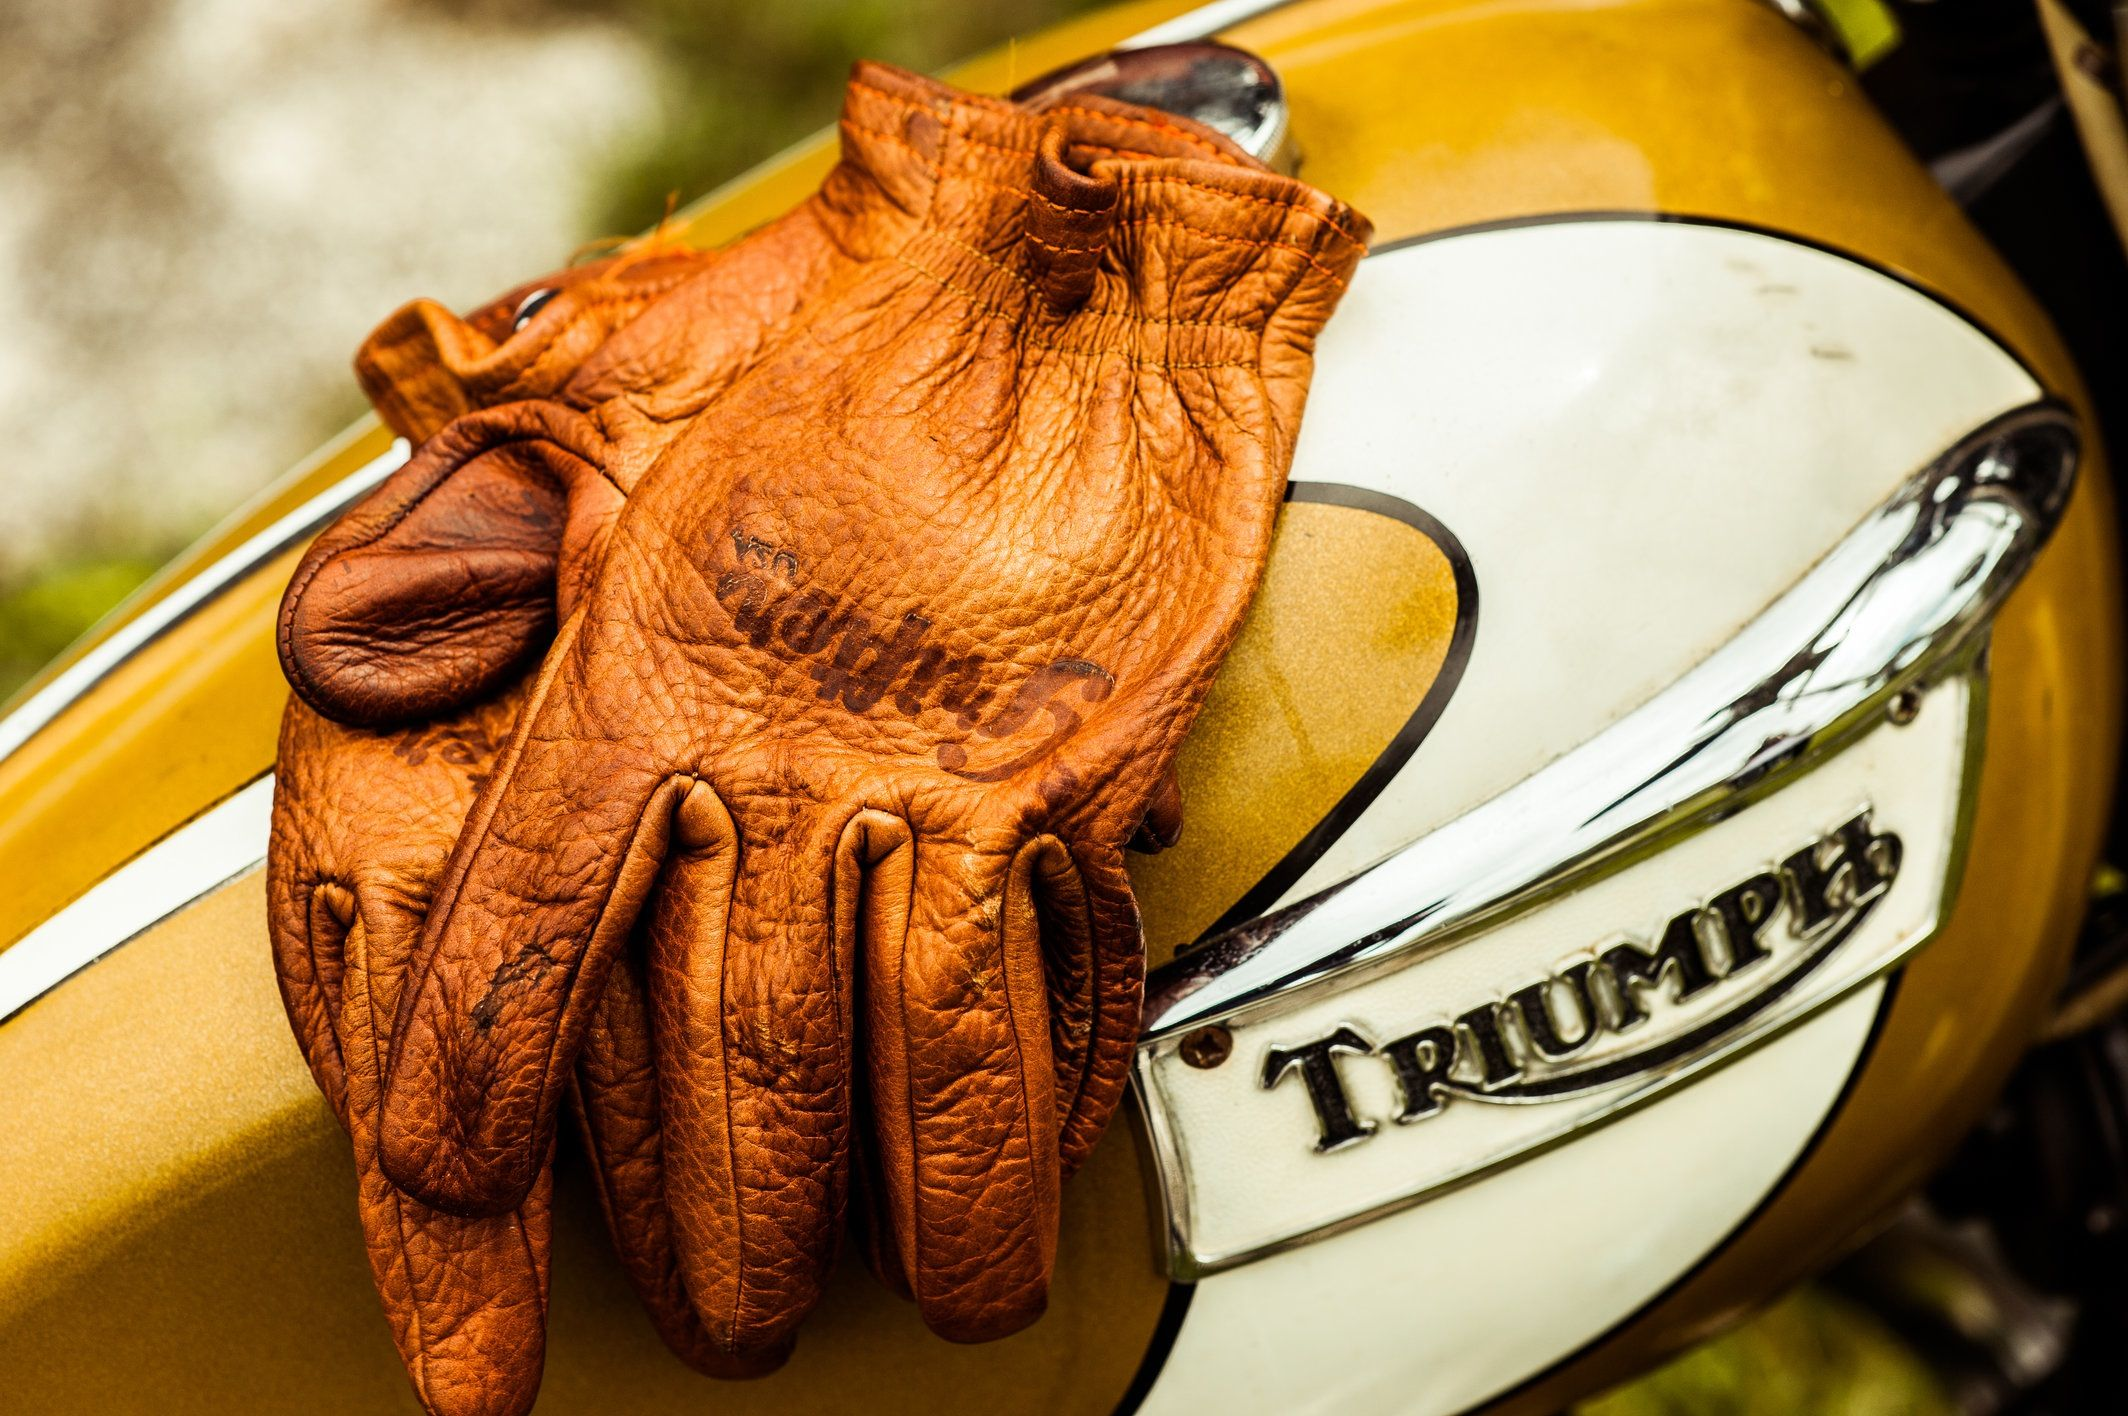 Bison Scoundrels | Gloves, Vintage motorcycles, Motorcycle ...